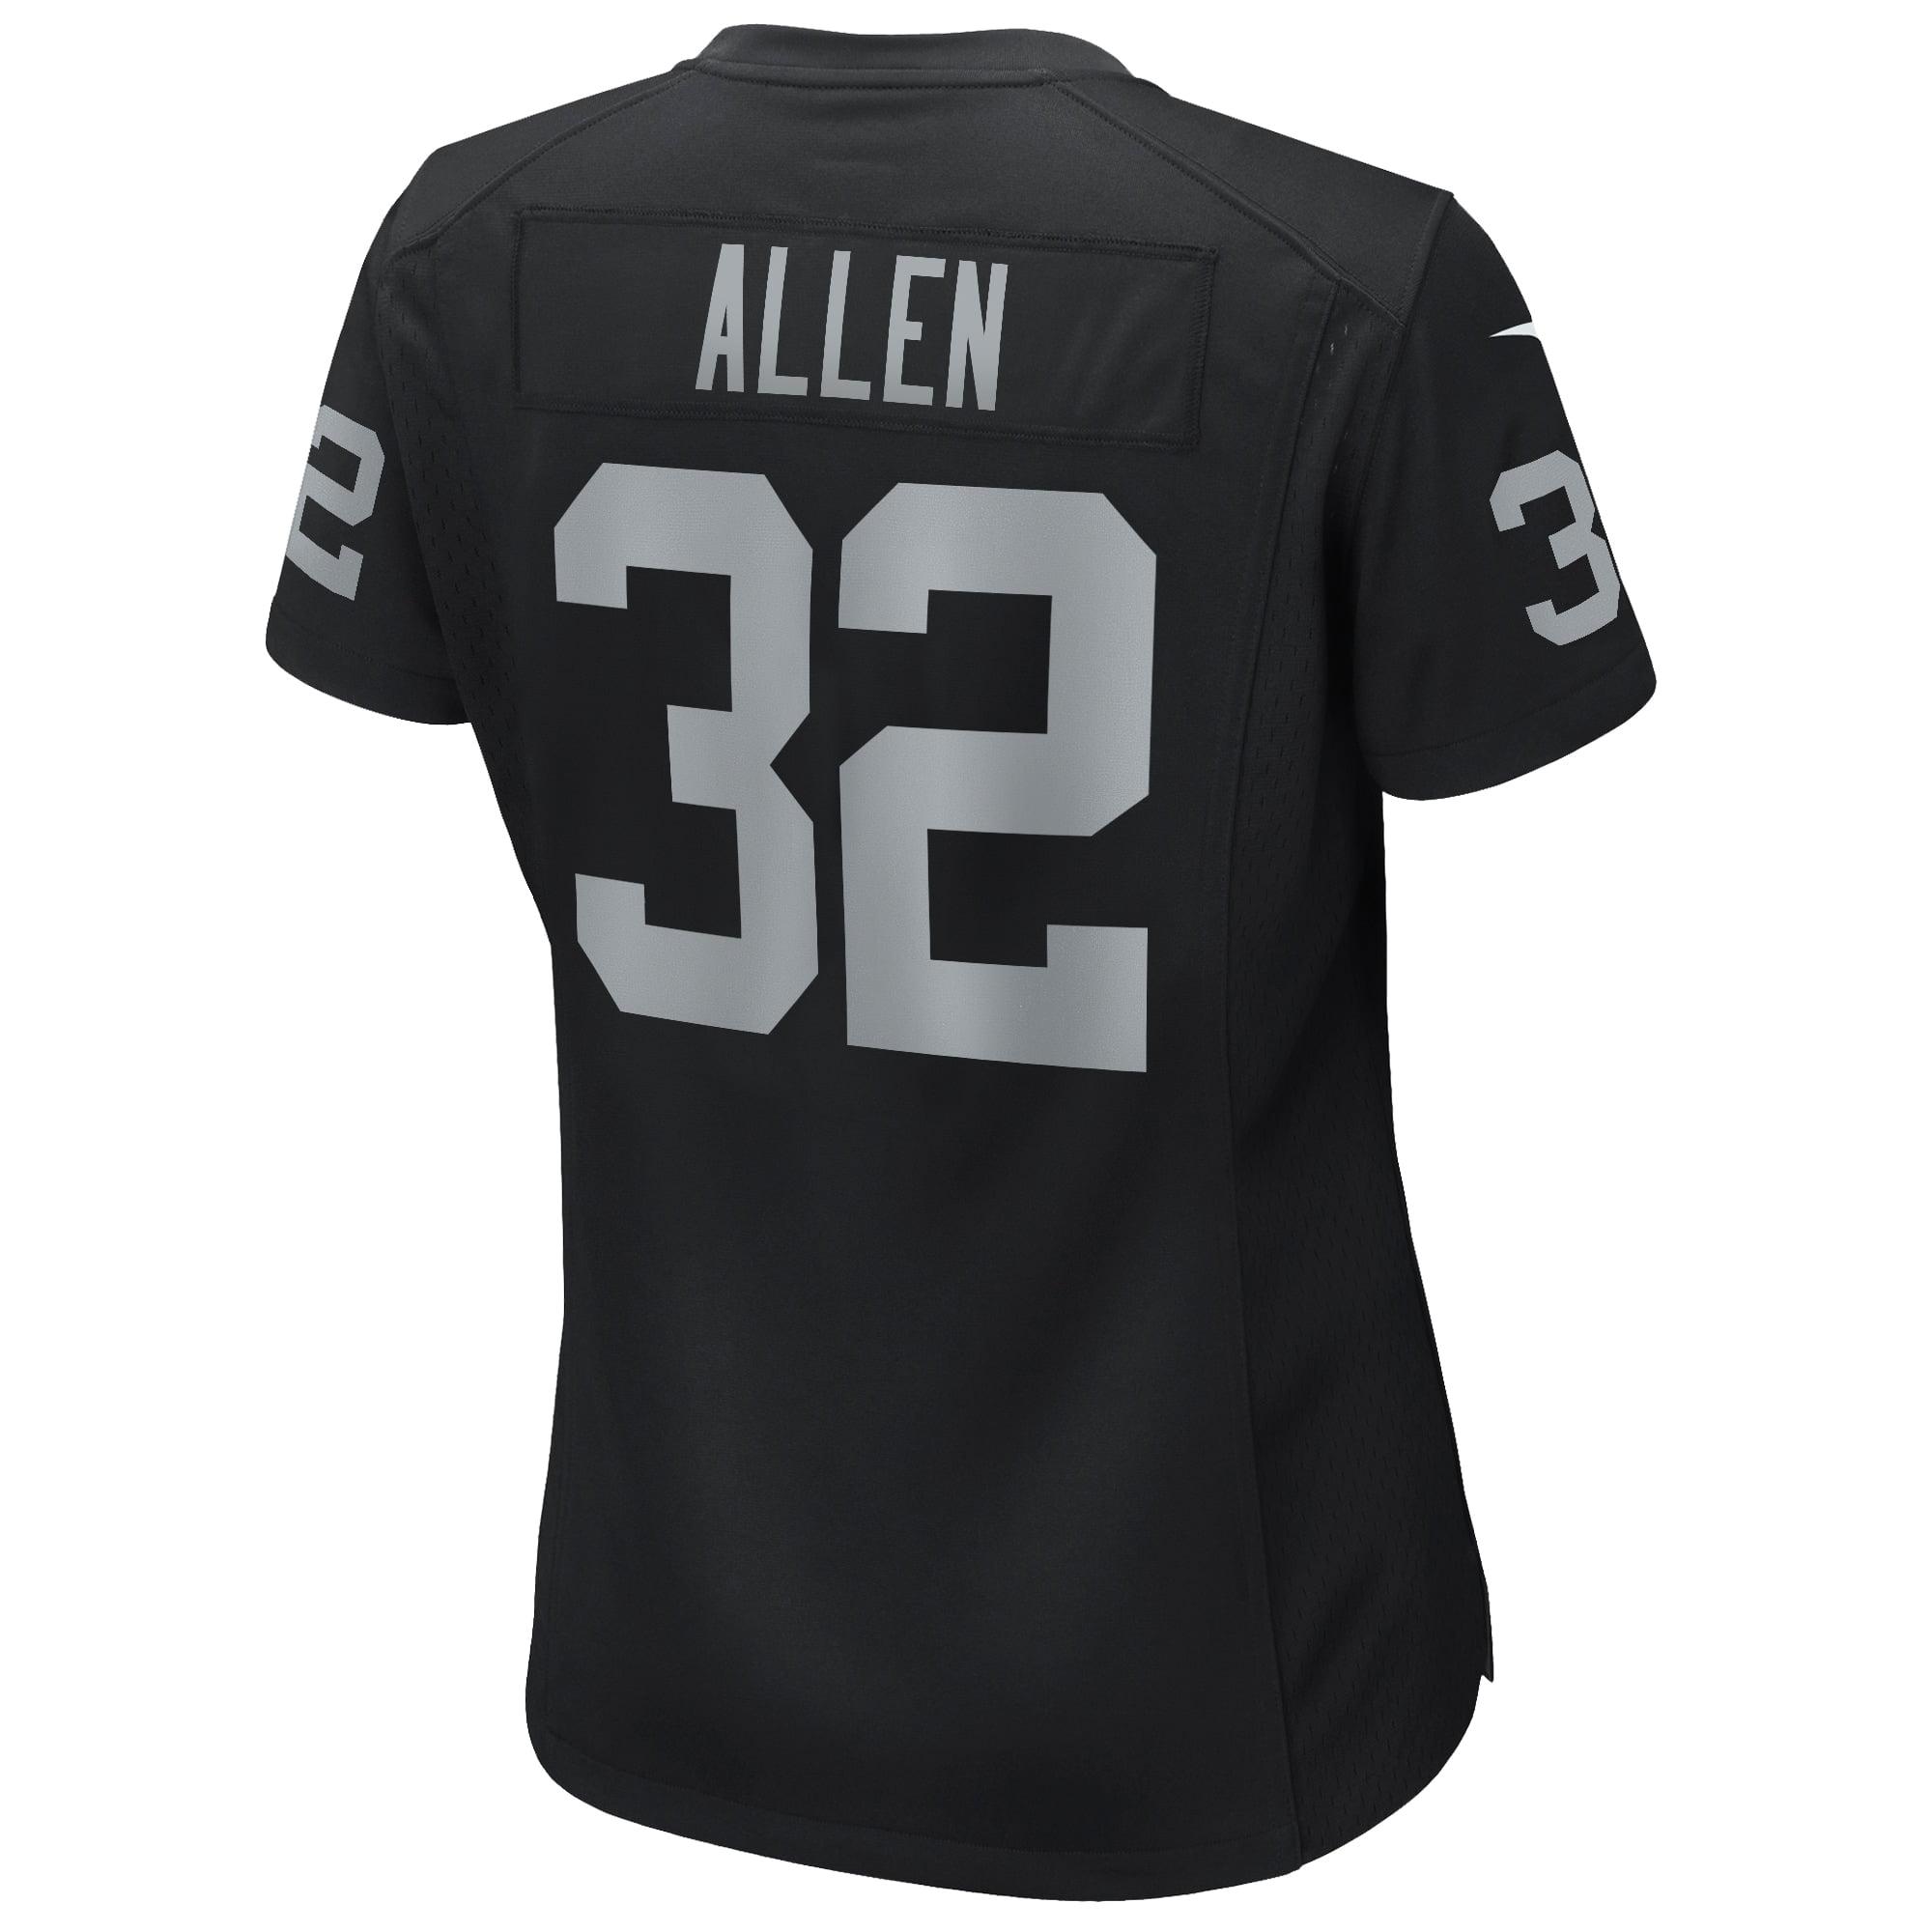 Marcus Allen Las Vegas Raiders Nike Women's Game Retired Player Jersey - Black